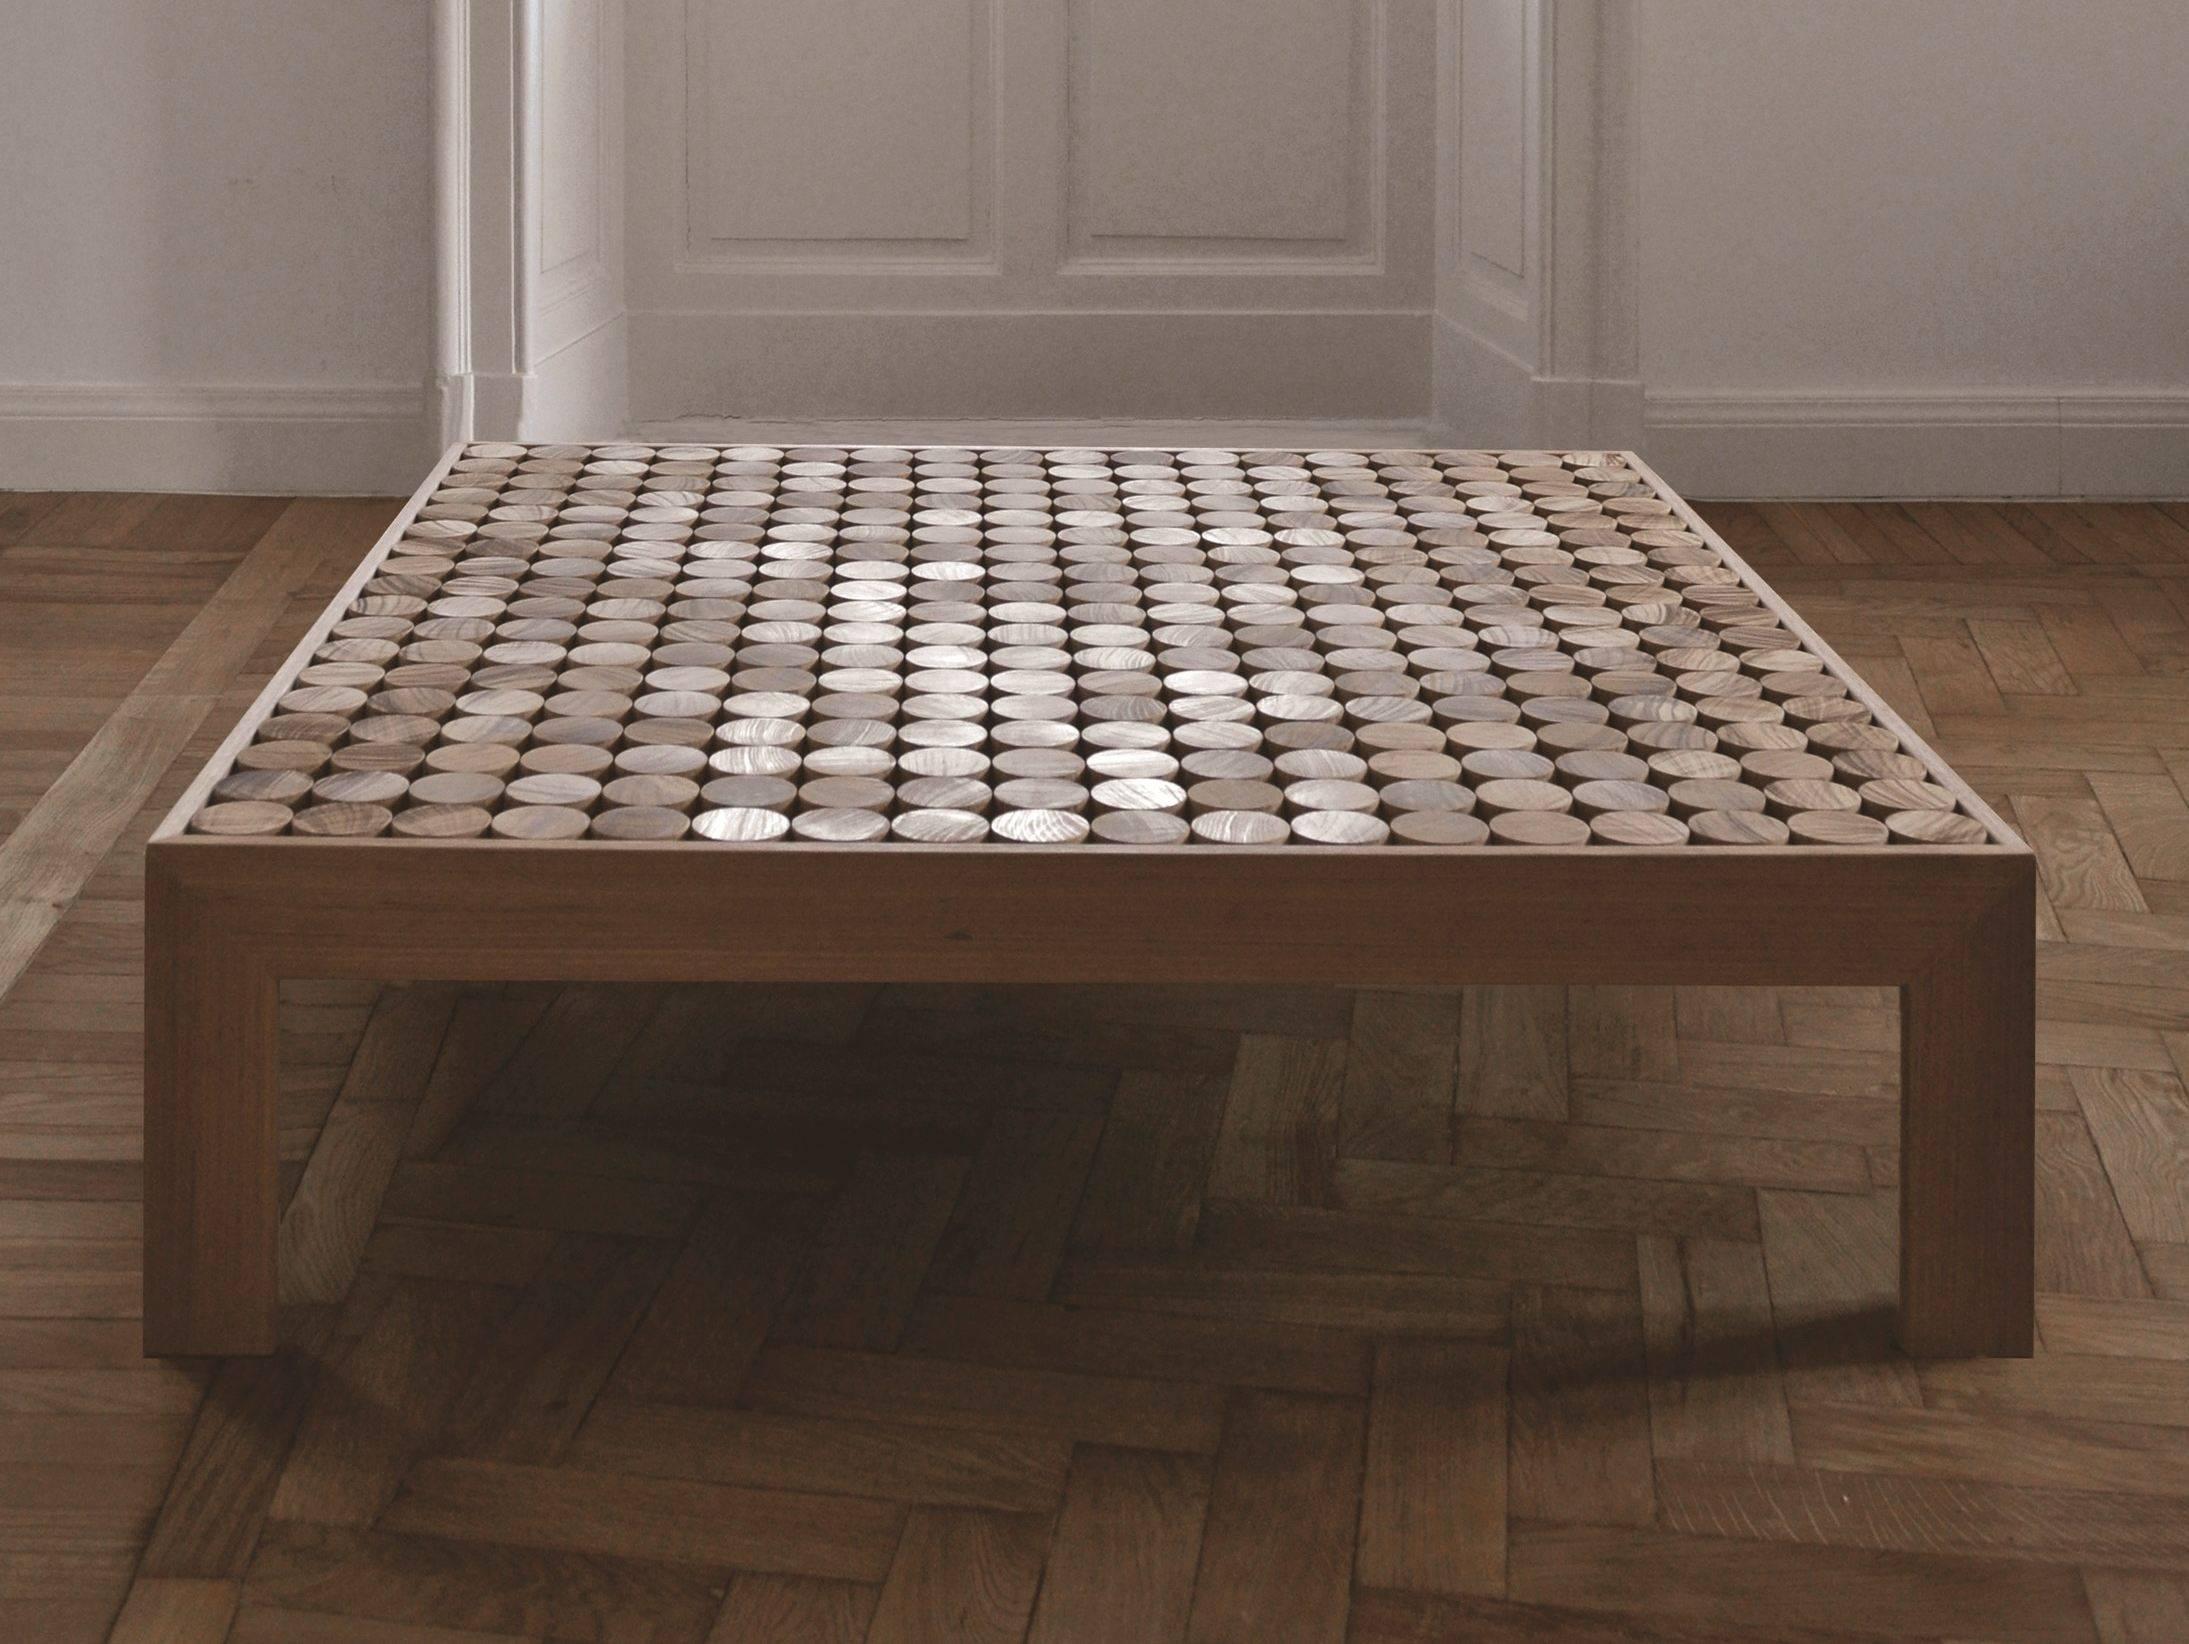 Exciting Solid Wood Coffee Table – Radioritas With Large Solid Wood Coffee Tables (View 6 of 15)